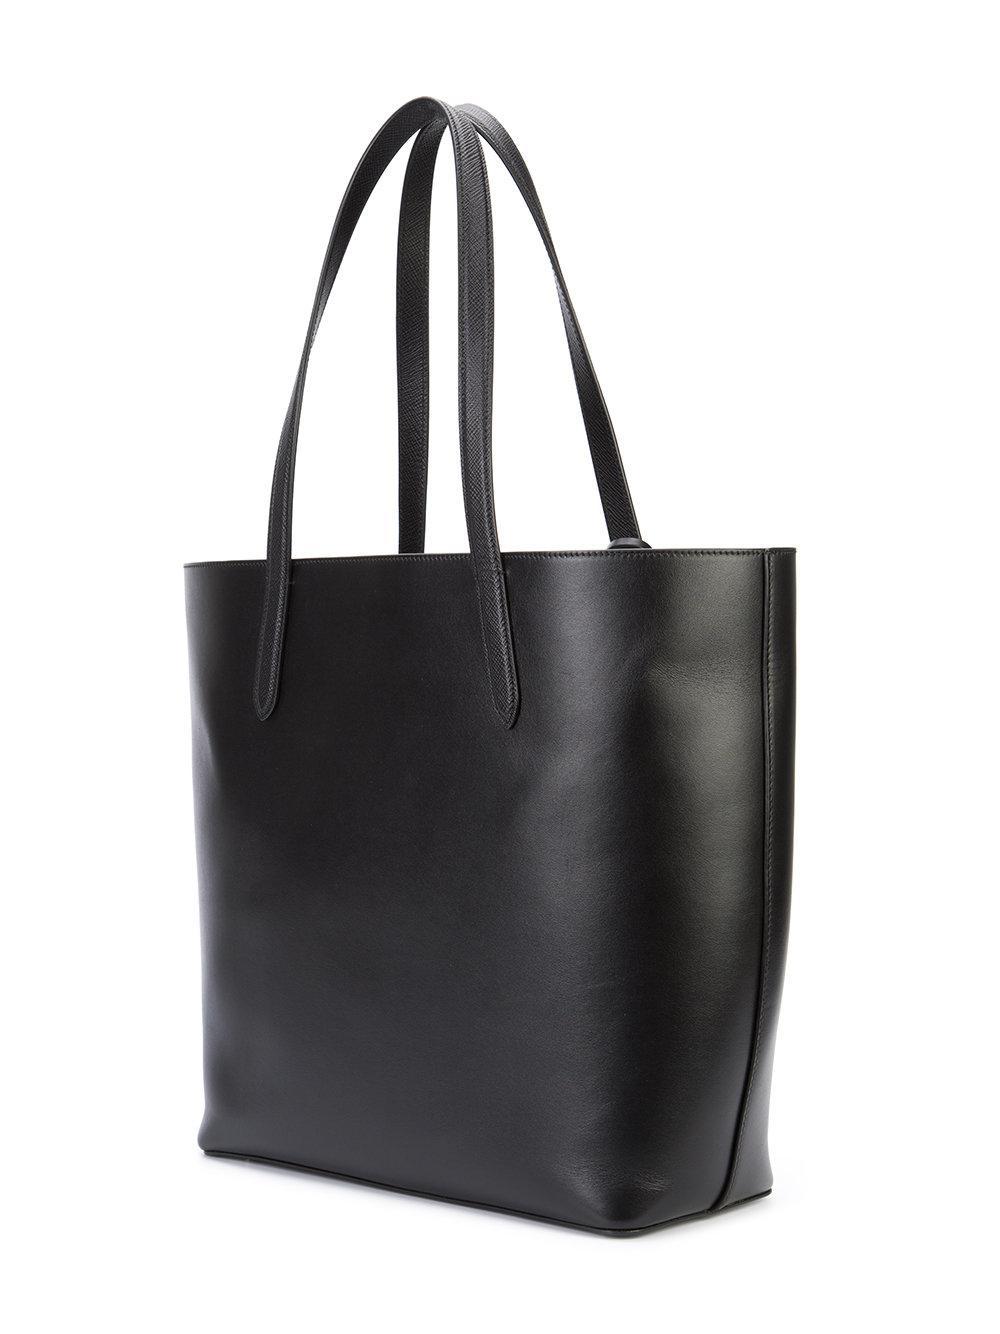 SMYTHSON Grand sac à main rectangulaire avBt7sIur1